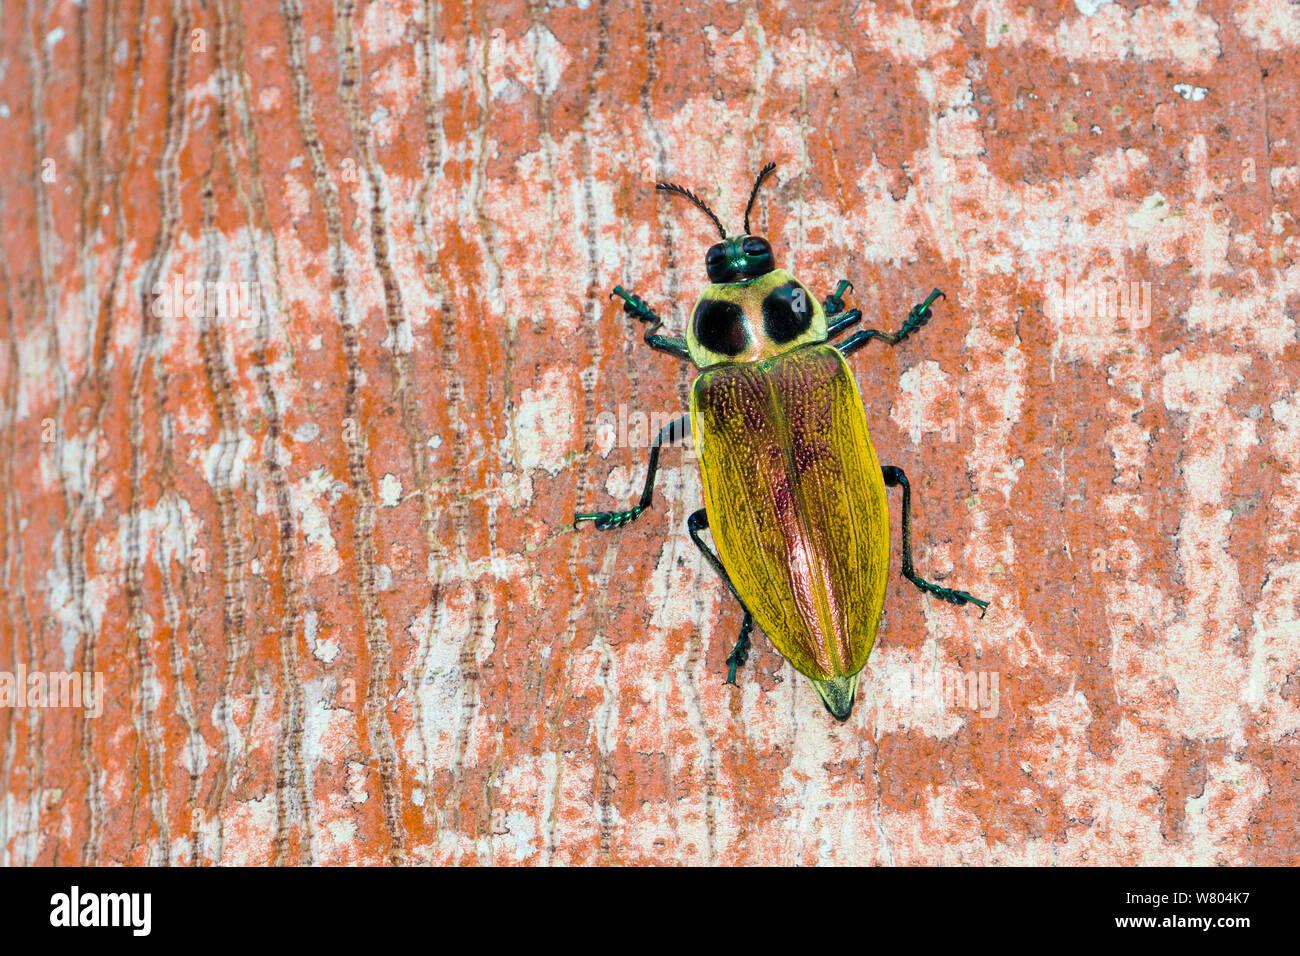 Borer Beetle Stock Photos & Borer Beetle Stock Images - Alamy